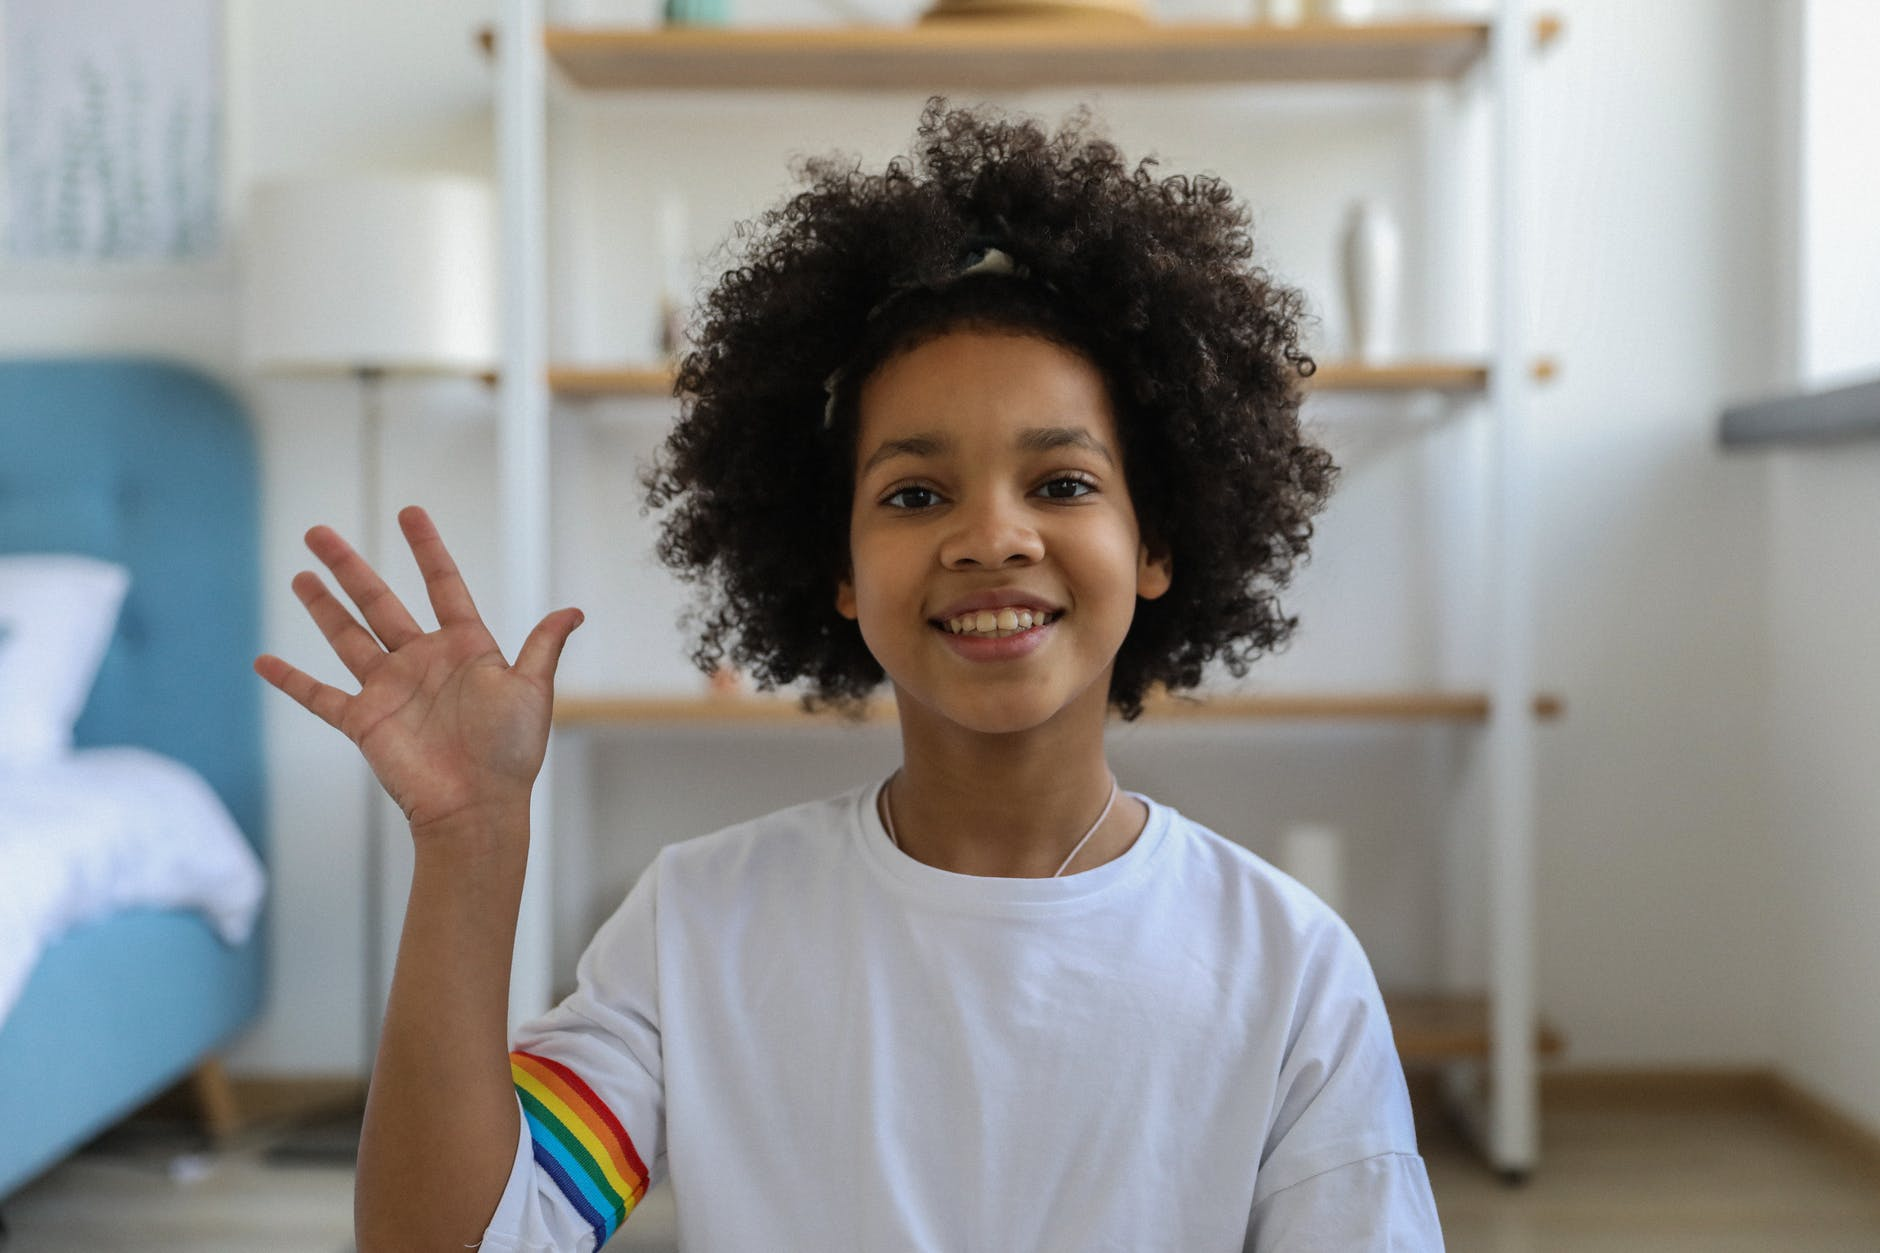 Child sitting in room waving